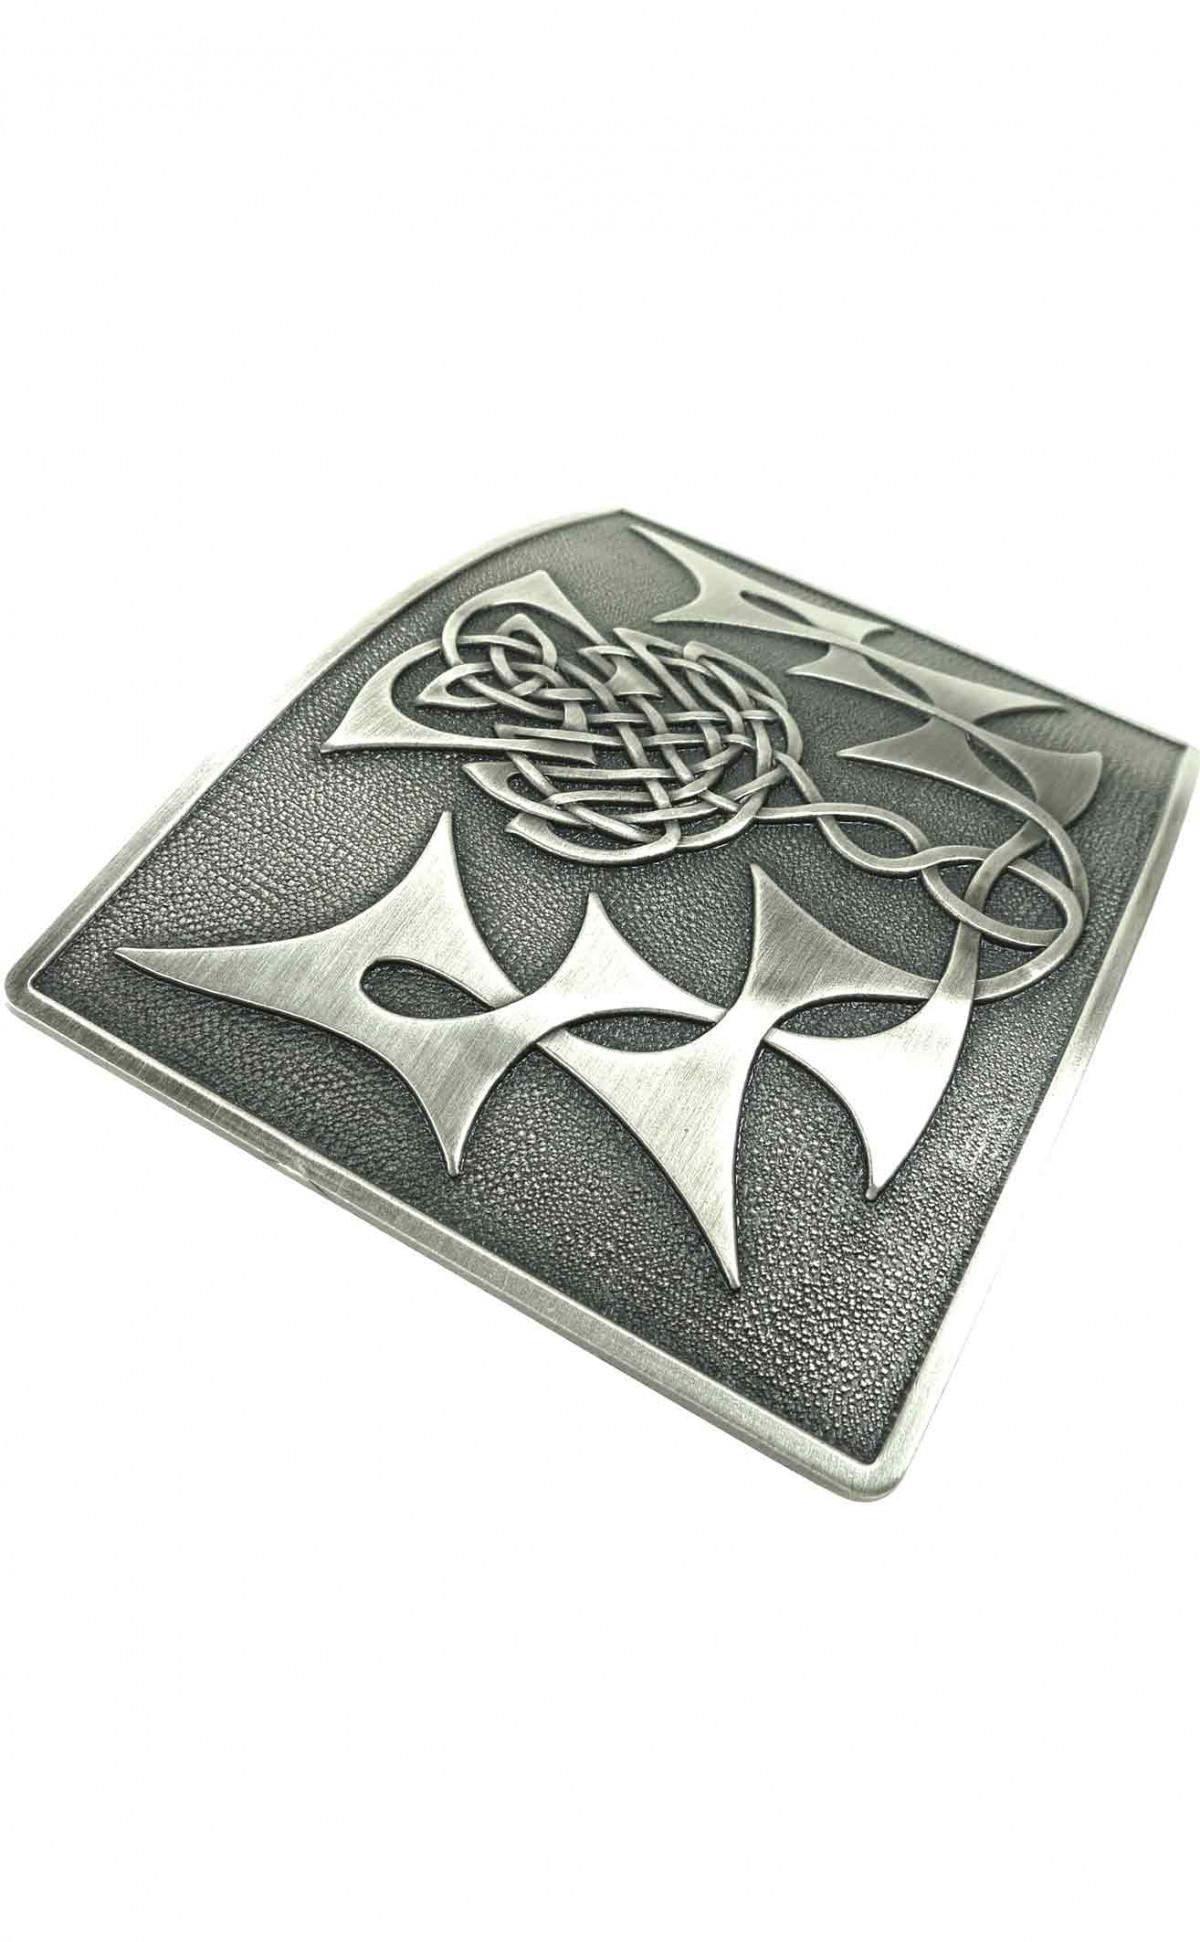 Beautiful Scottish Belt Buckle possibly silver